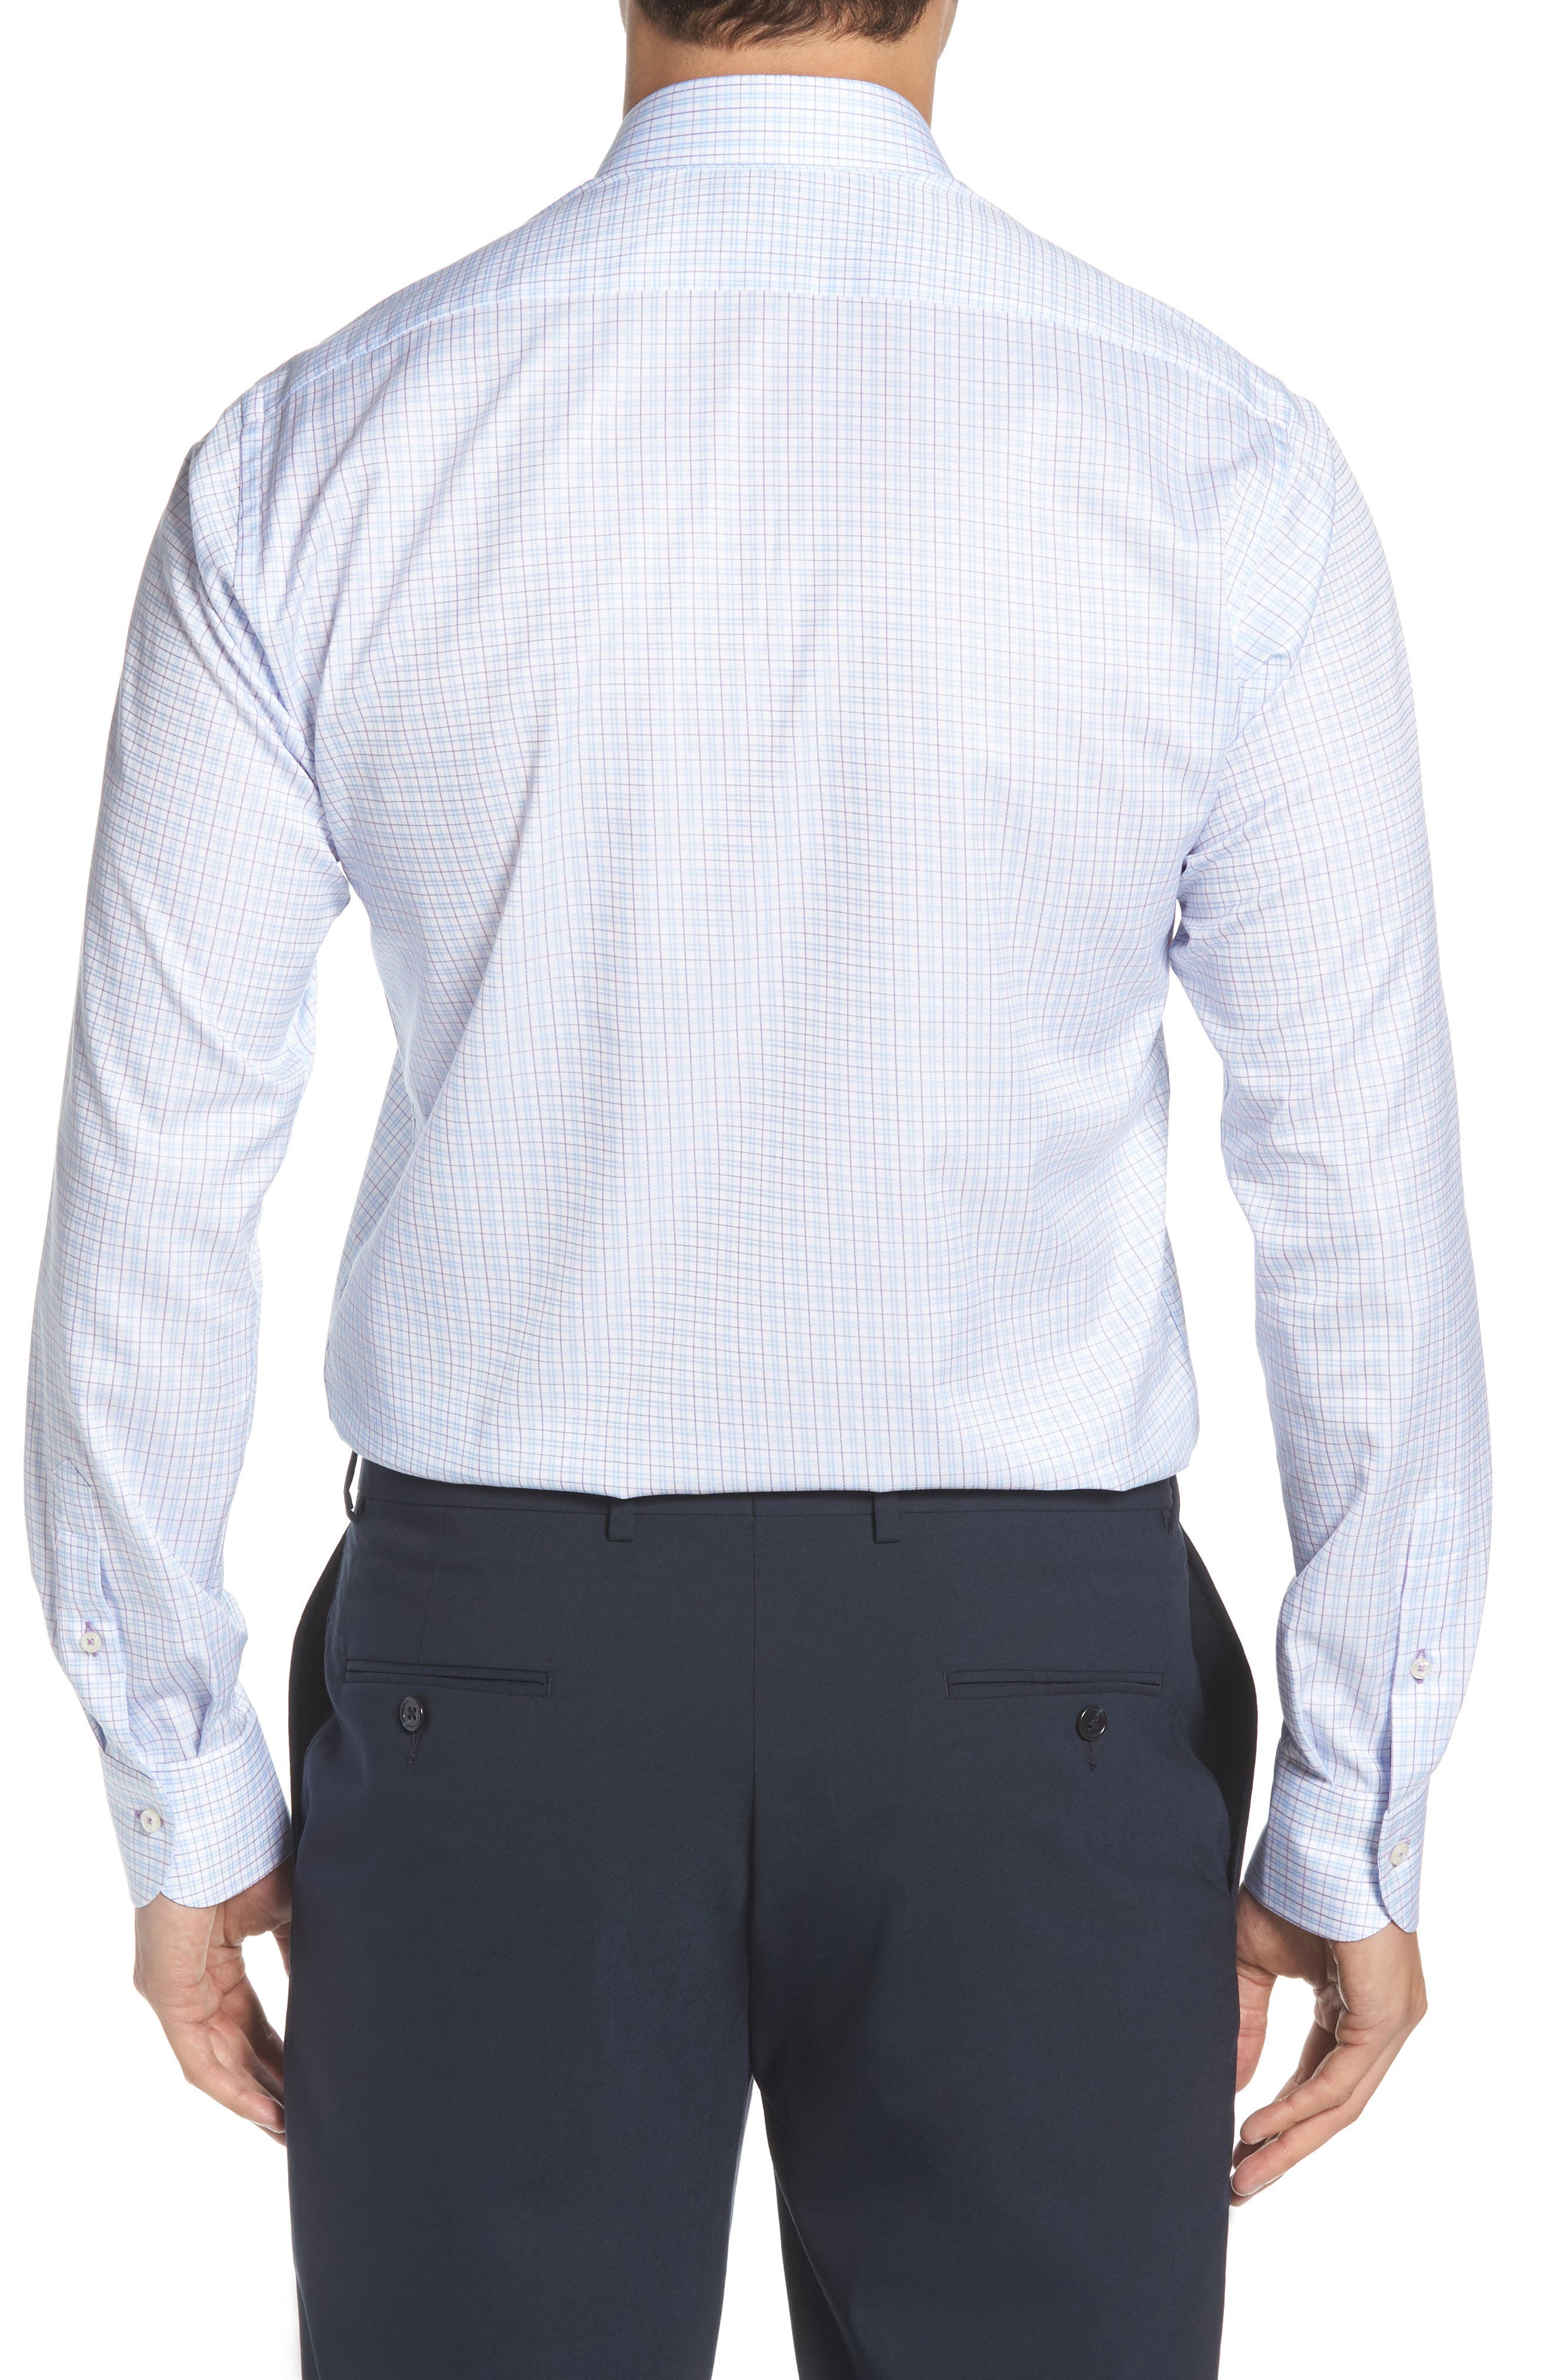 Regular Fit Check Dress Shirt,                             Alternate thumbnail 3, color,                             WHITE MULTI